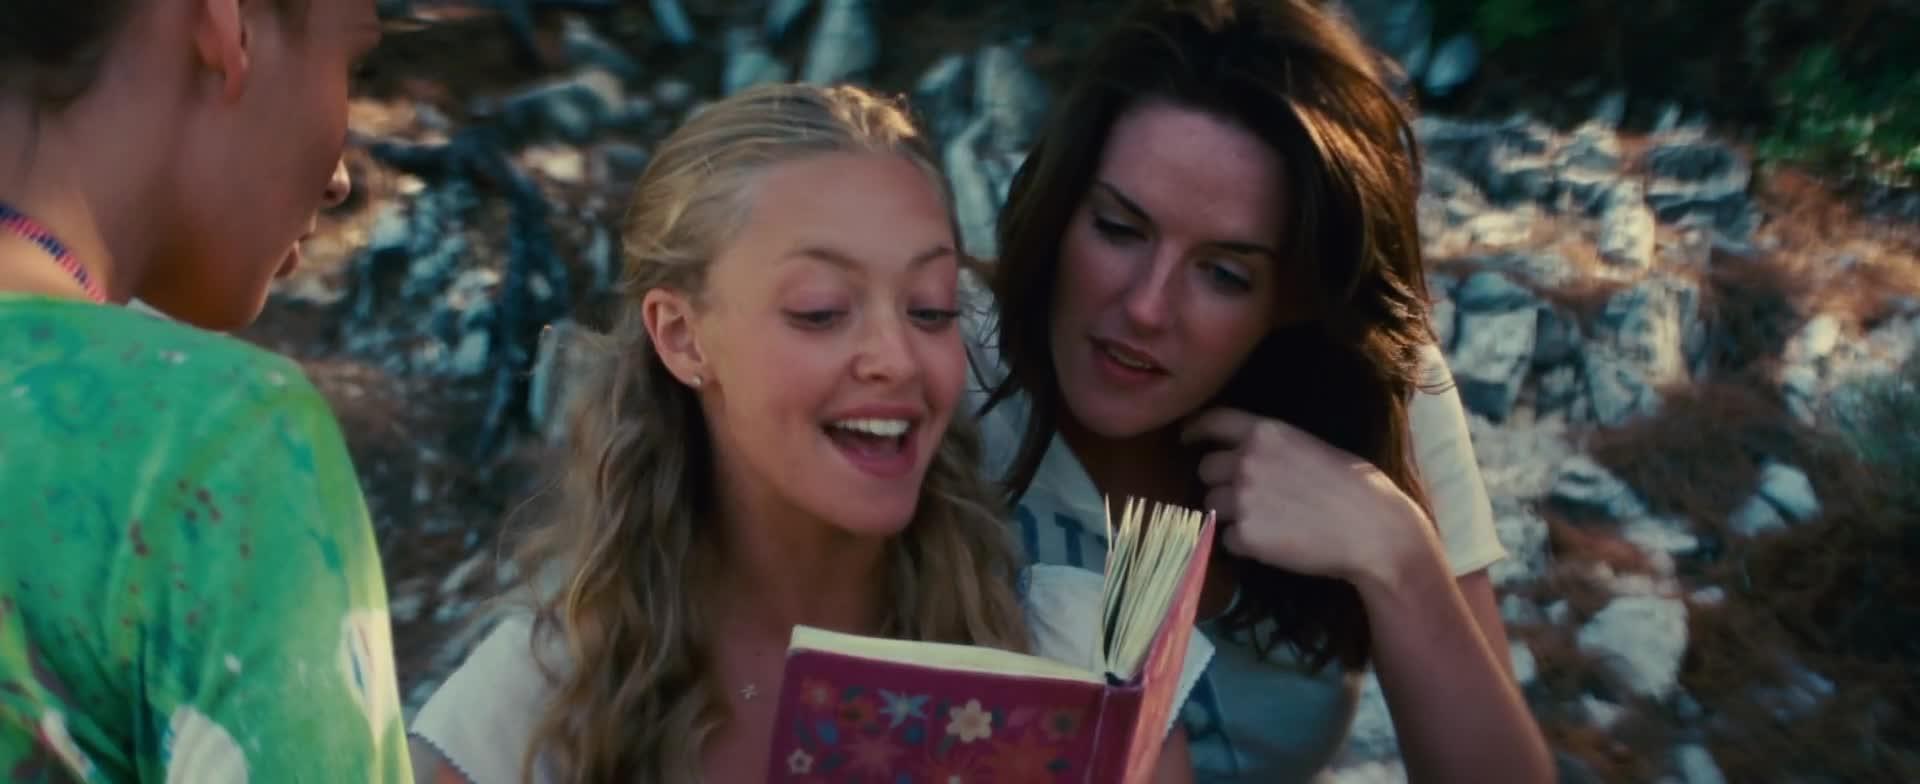 Mamma Mia 2008 Lektor Pl 1080p Wideo W Cdapl